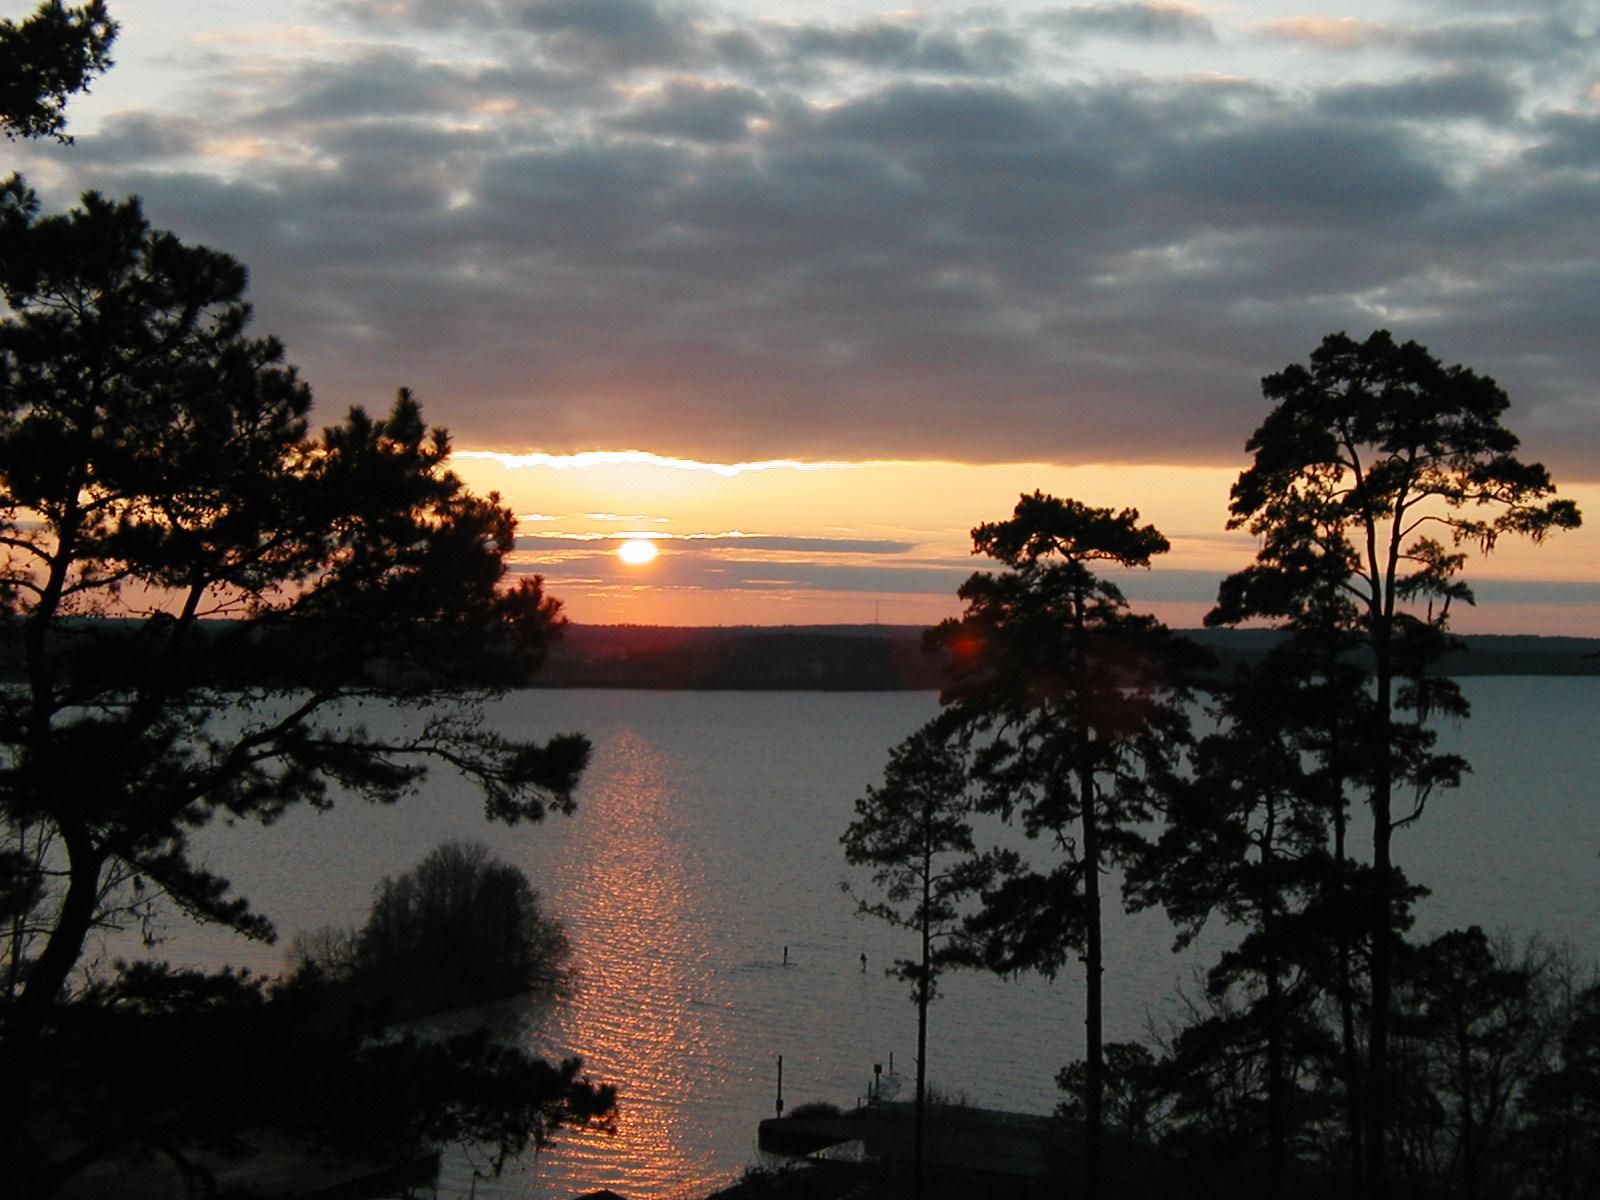 Lake seminole coastal angler the angler magazine for Island beach state park fishing report